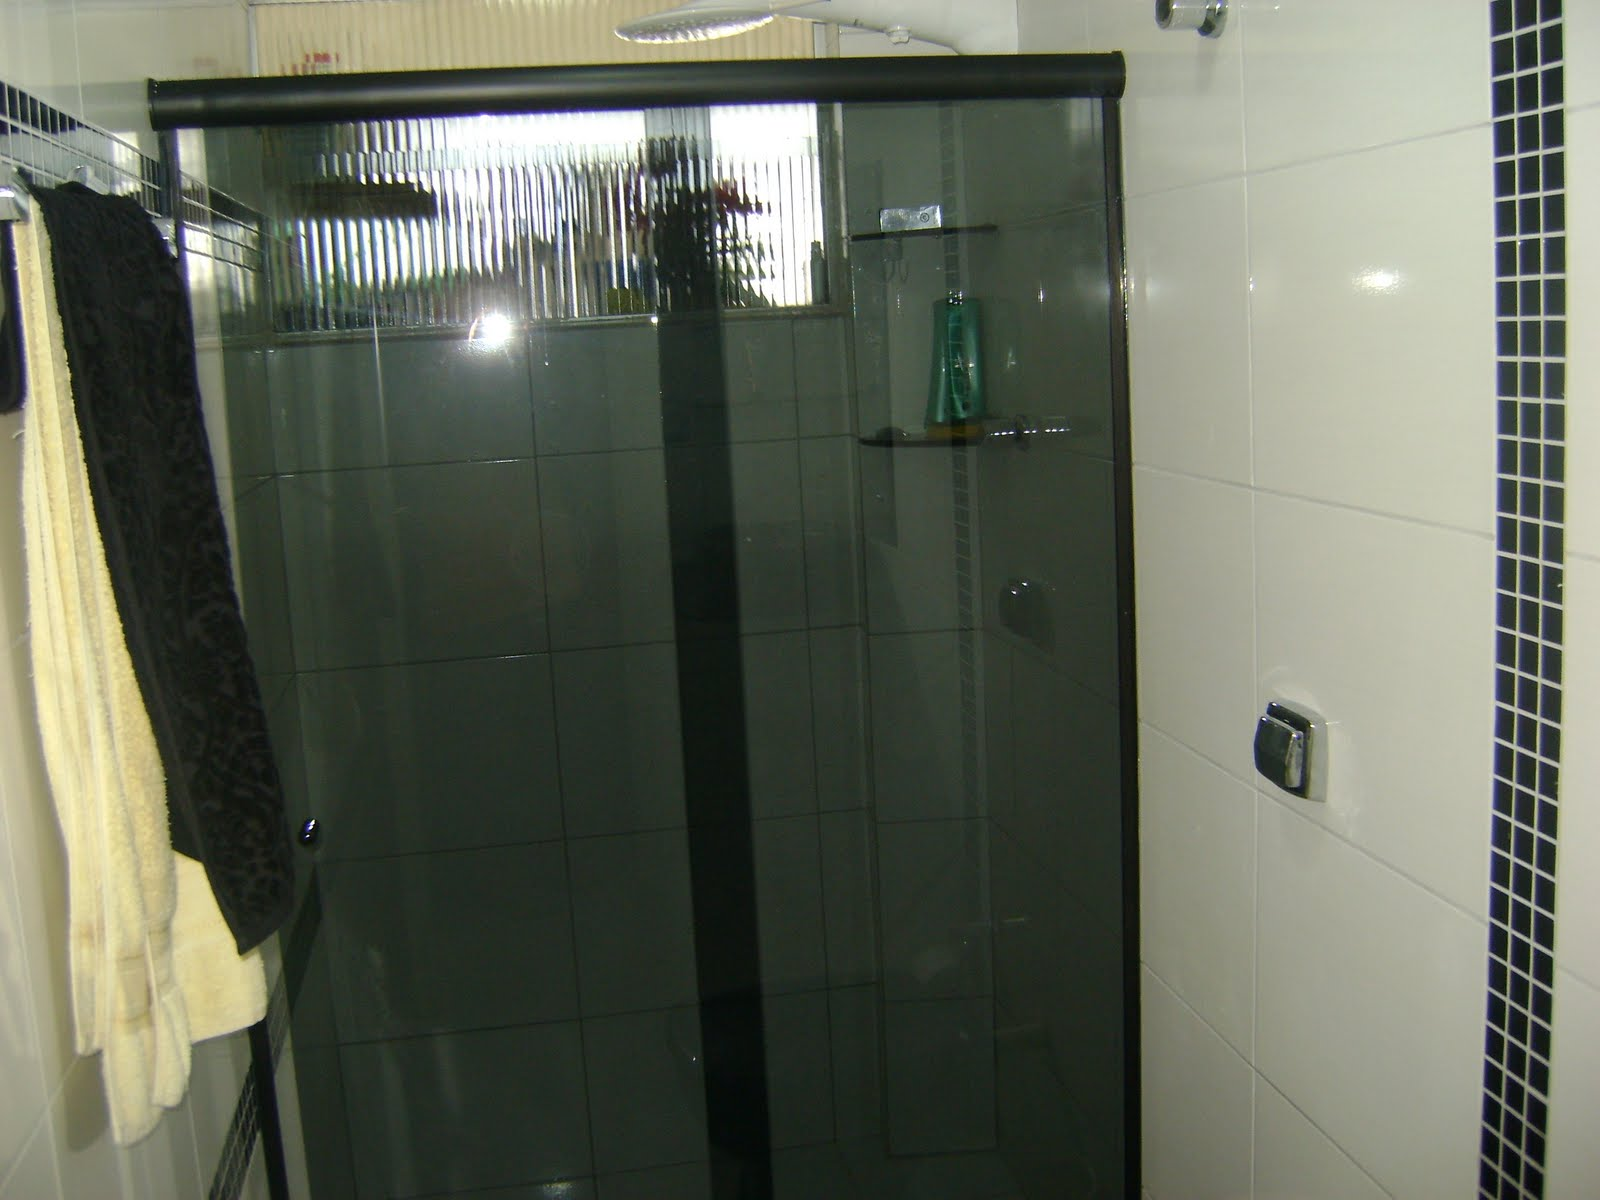 Bazar do Alumínio: BOX BLINDEX PARA BANHEIRO CONFIRA NOSSOS  #7B7850 1600x1200 Armario De Banheiro De Blindex